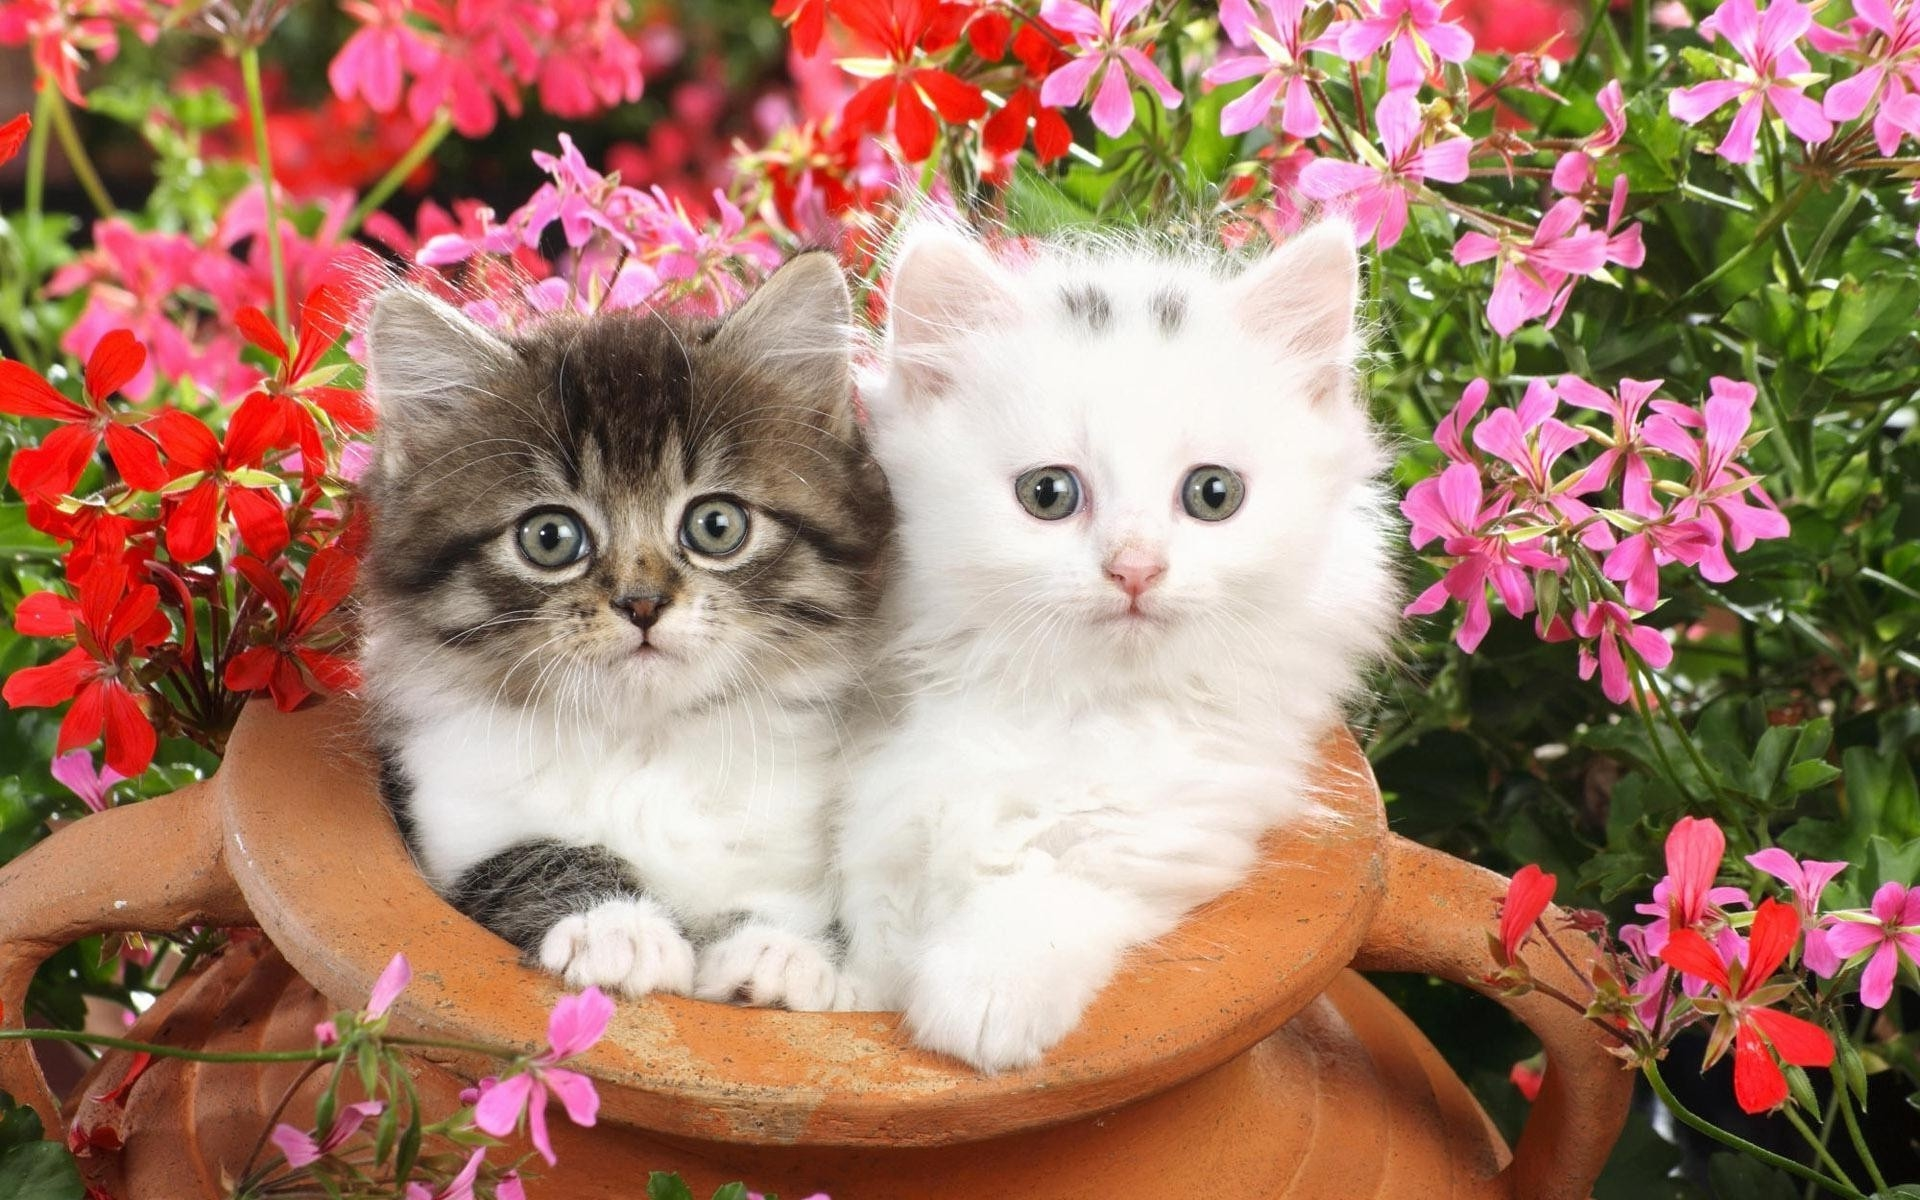 Обои на телефон котята красивые (3)